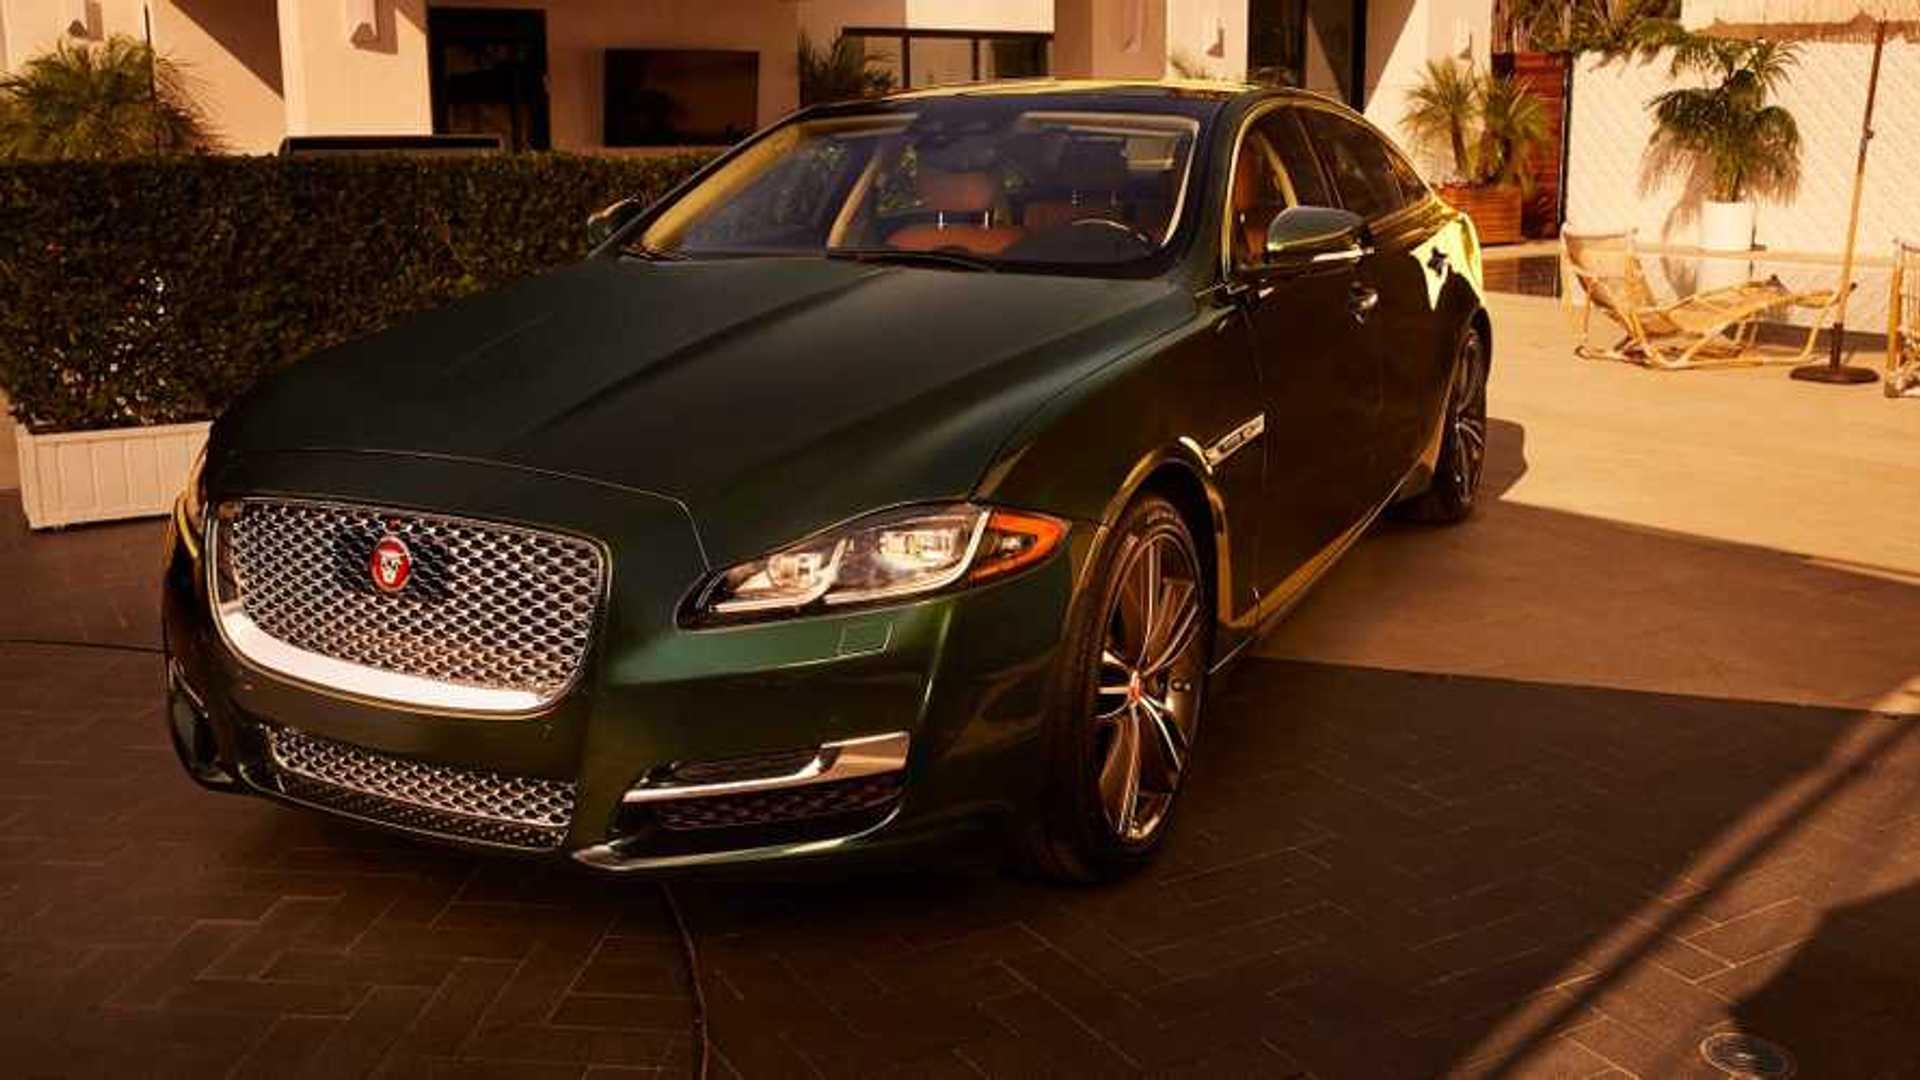 Jaguar XJ Collection Marks End Of Big Sedan's Ninth Life